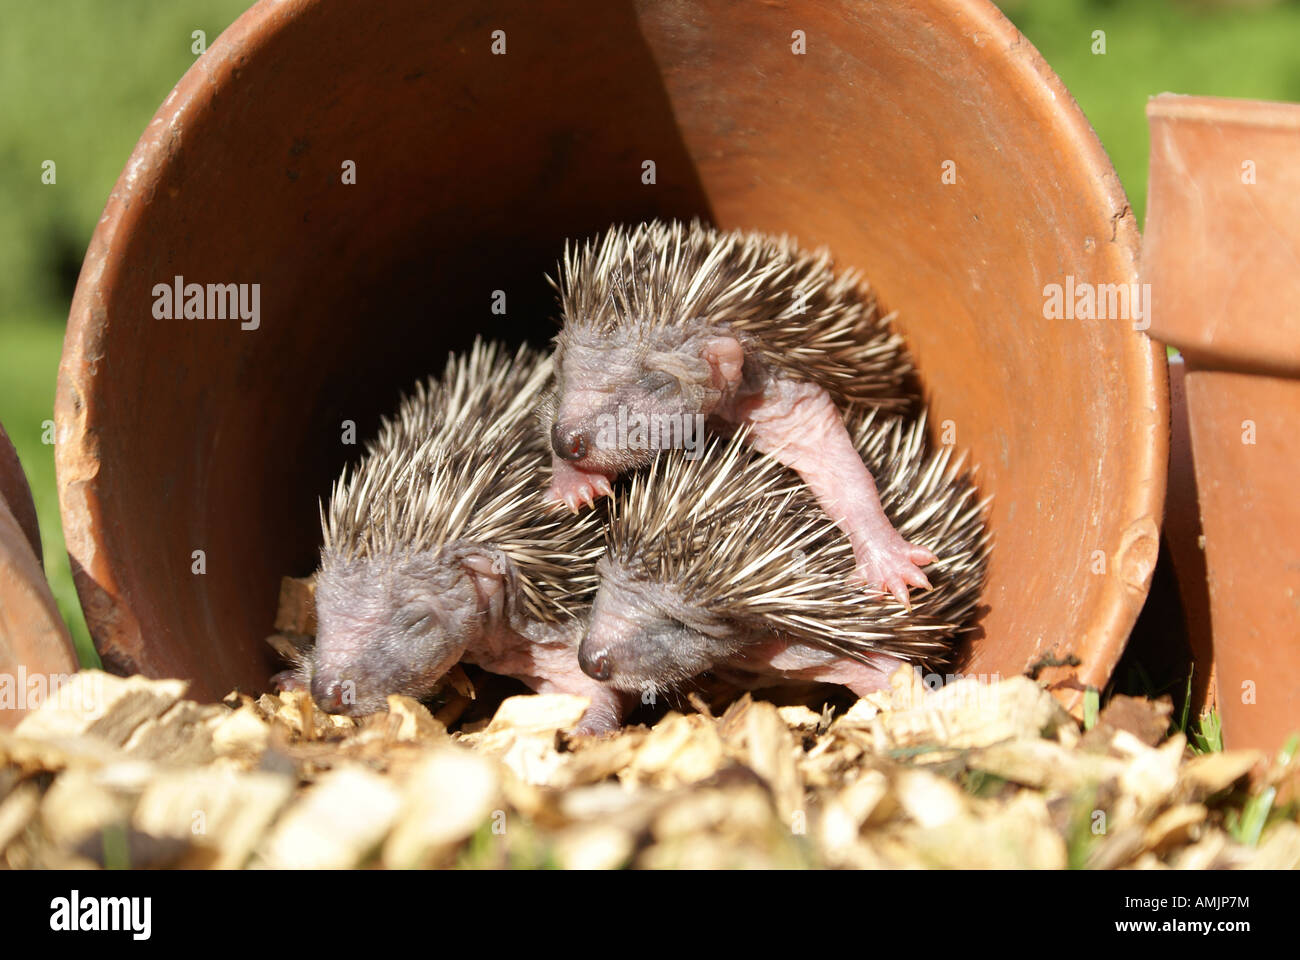 Baby Hedgehogs in flower pot - Stock Image